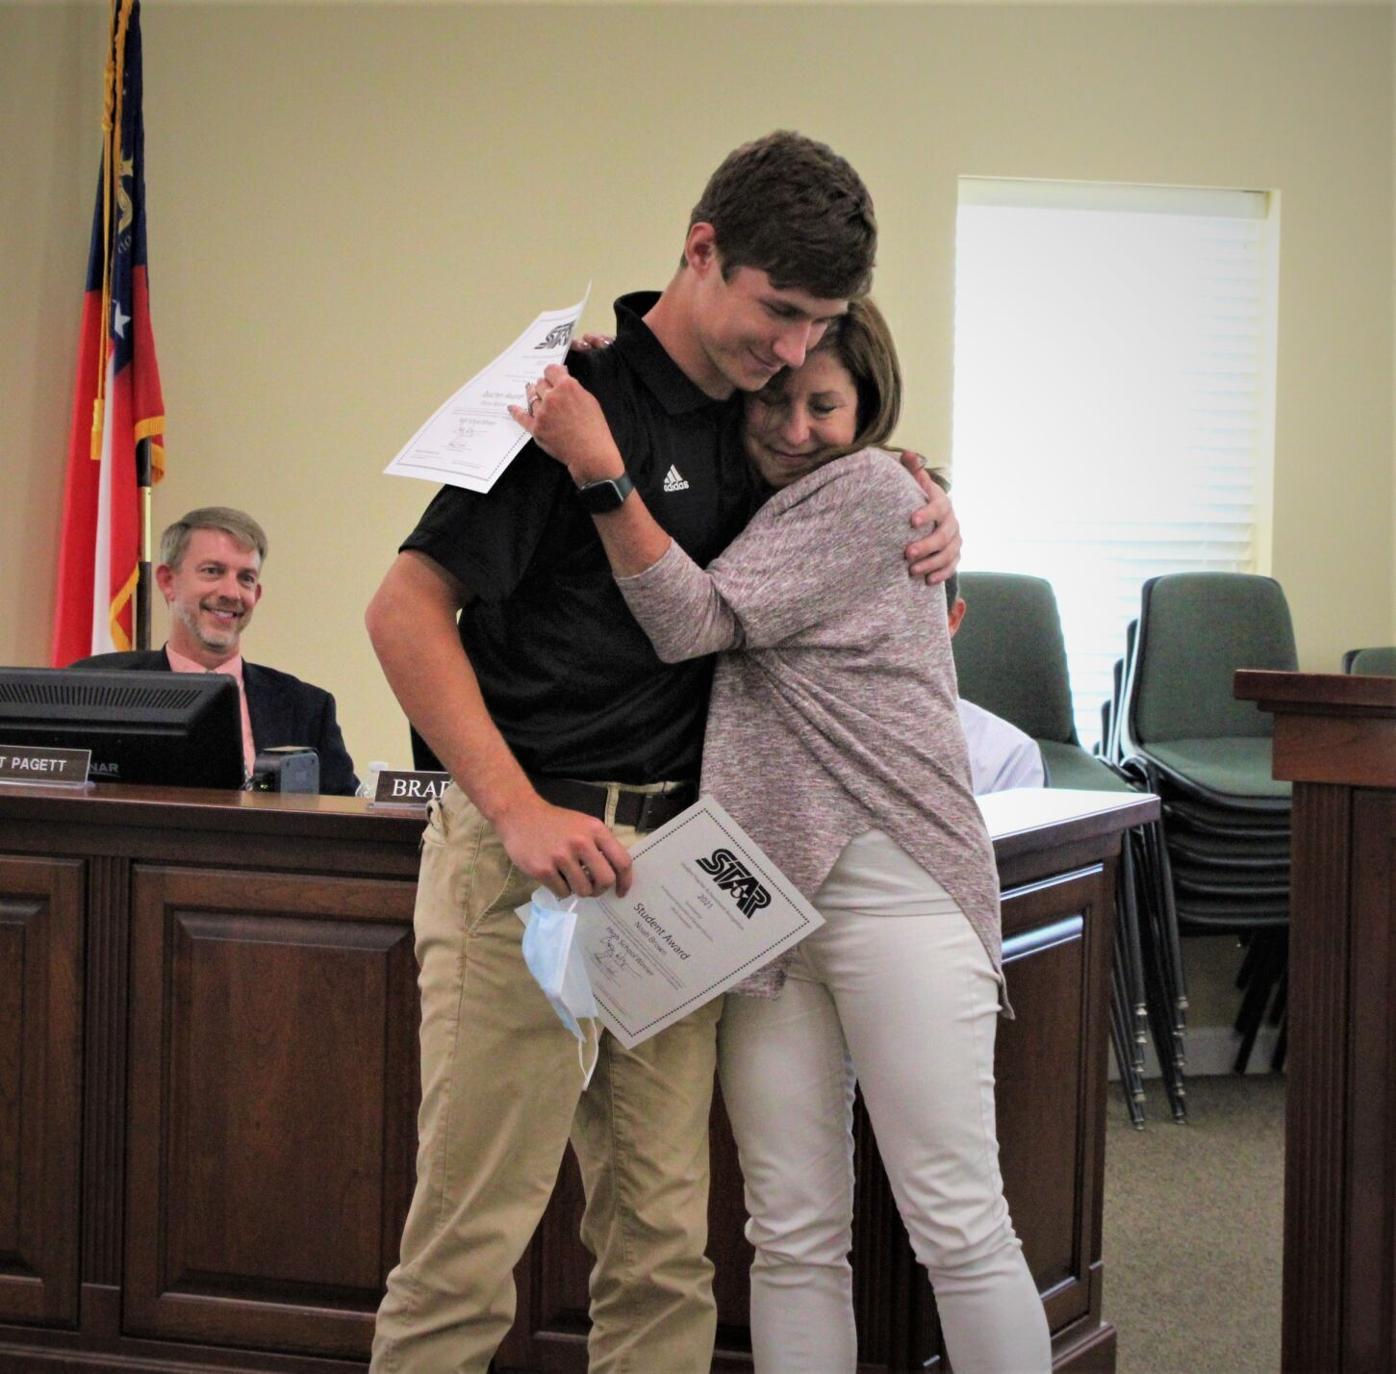 Star student hug